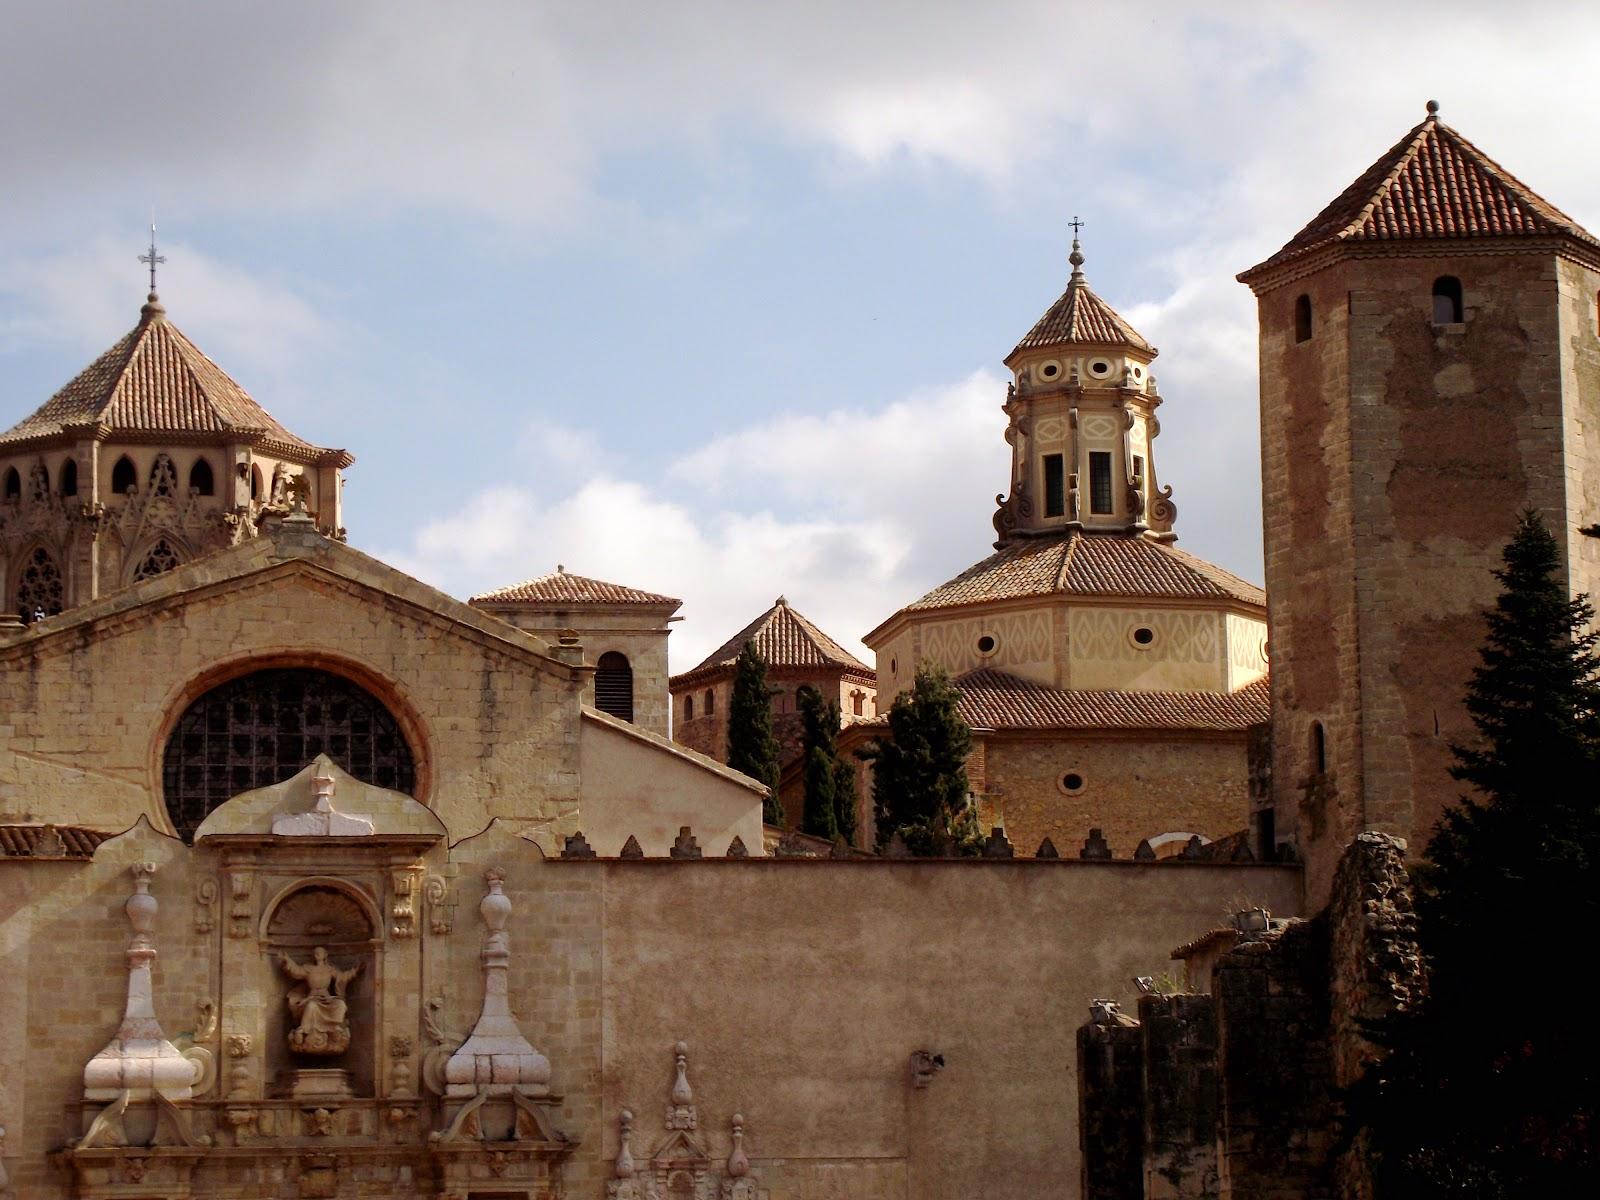 https://upload.wikimedia.org/wikipedia/commons/f/f5/Reial_Monestir_de_Santa_Maria_de_Poblet_(Vimbod%C3%AD_i_Poblet)_-_56